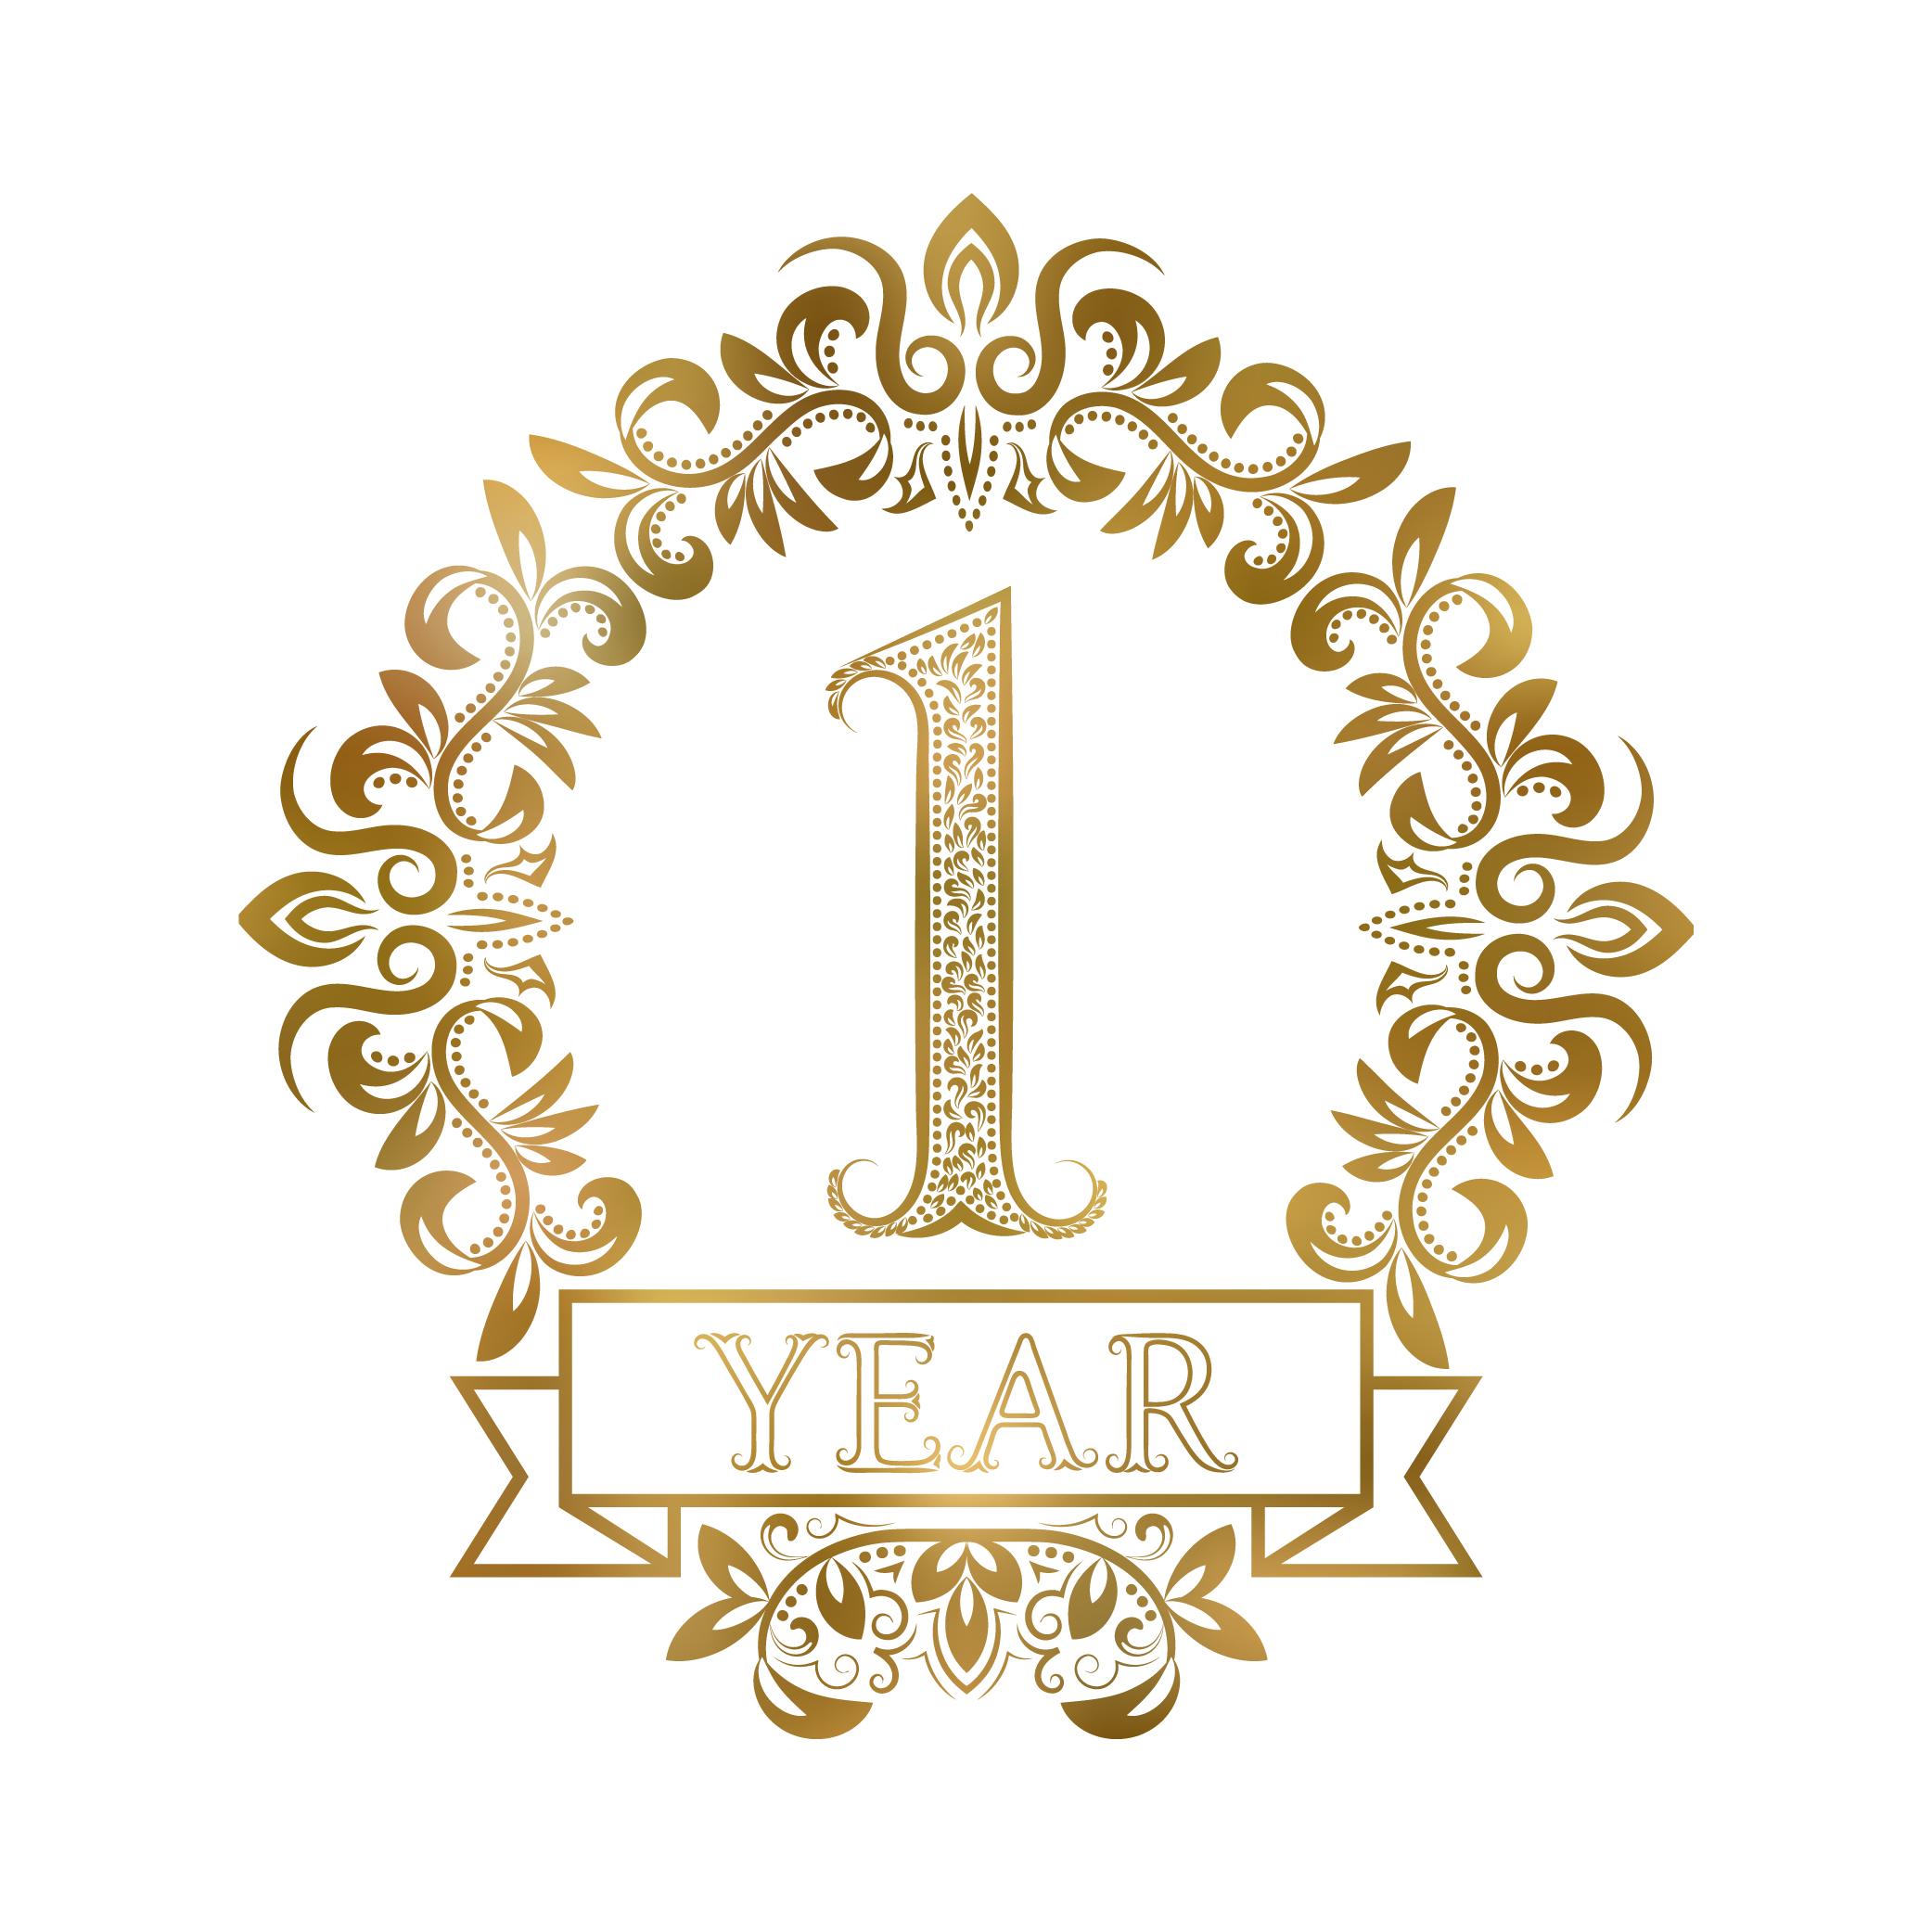 Happy Anniversary Azura Skin Care Center!